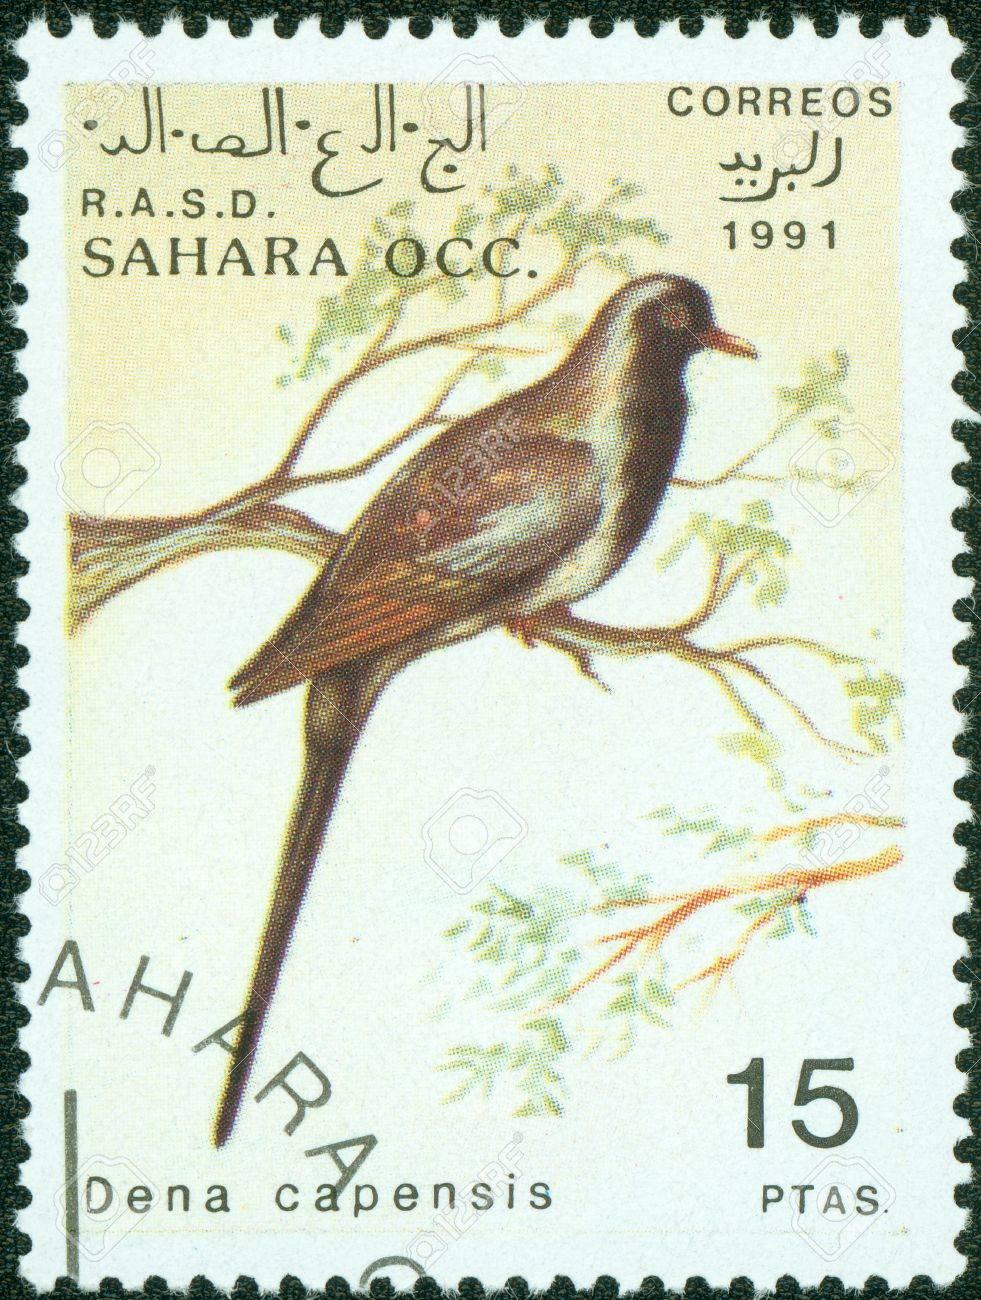 SAHARA OCC RASD - CIRCA 1991  A stamp printed in Sahara OCC  R A S D showing bird dena capensis , circa 1991 Stock Photo - 14778413